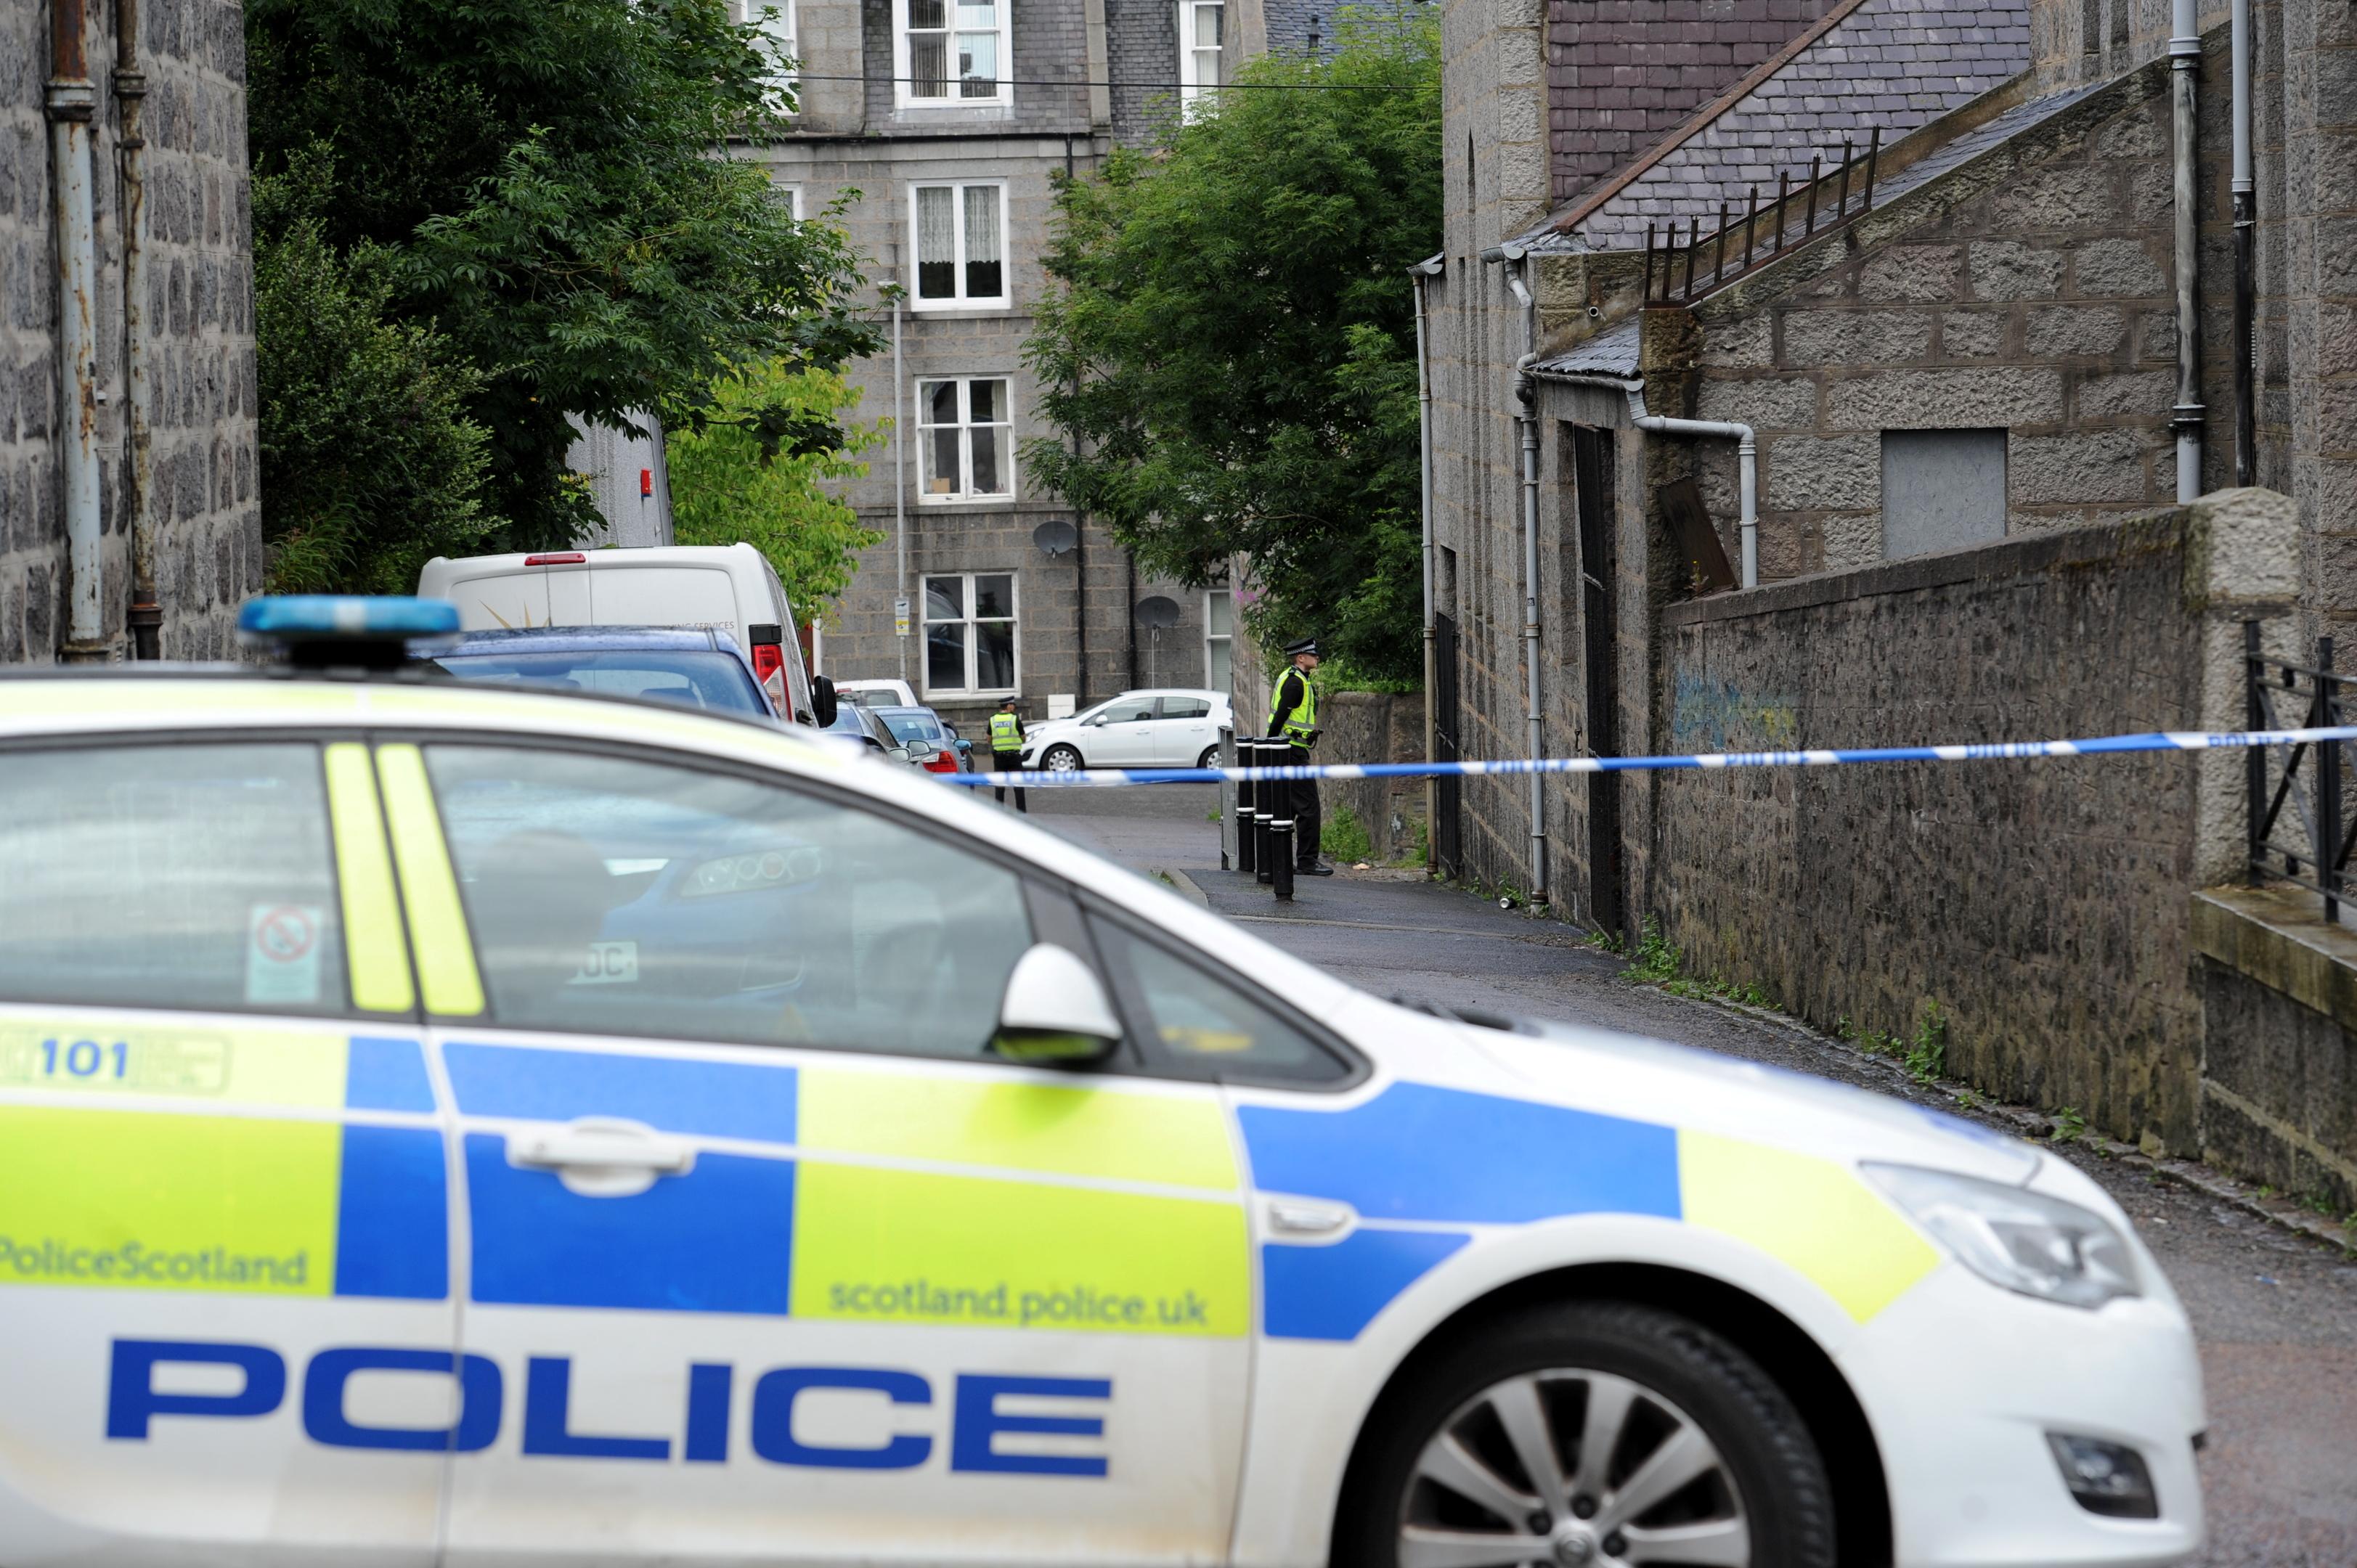 Police sealed off Grampian Lane in Torry